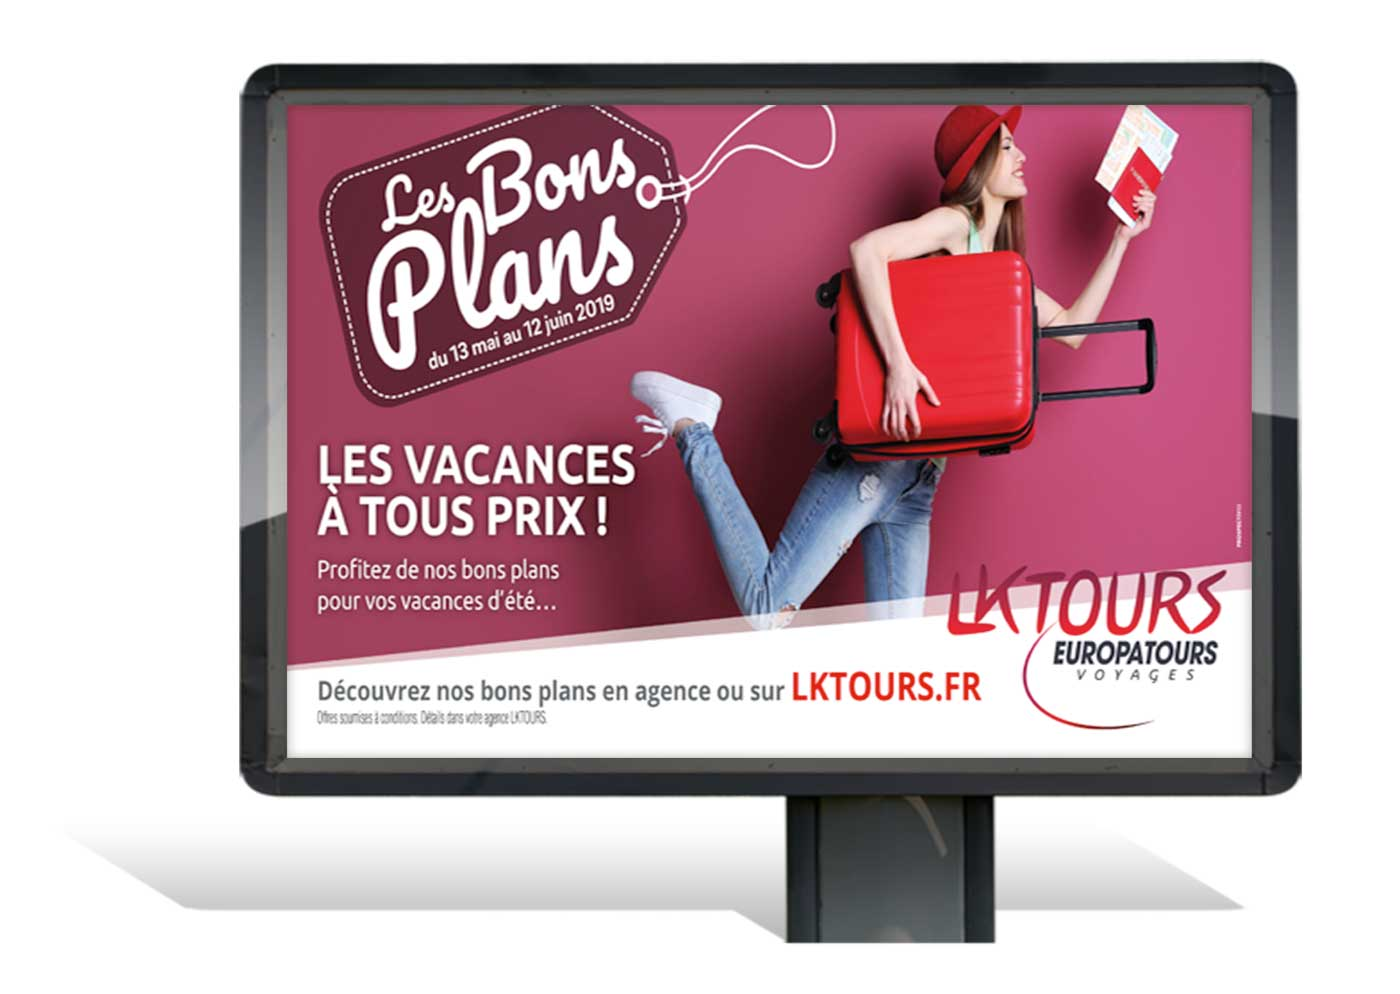 campagne-promotion-bonplan-lktours1